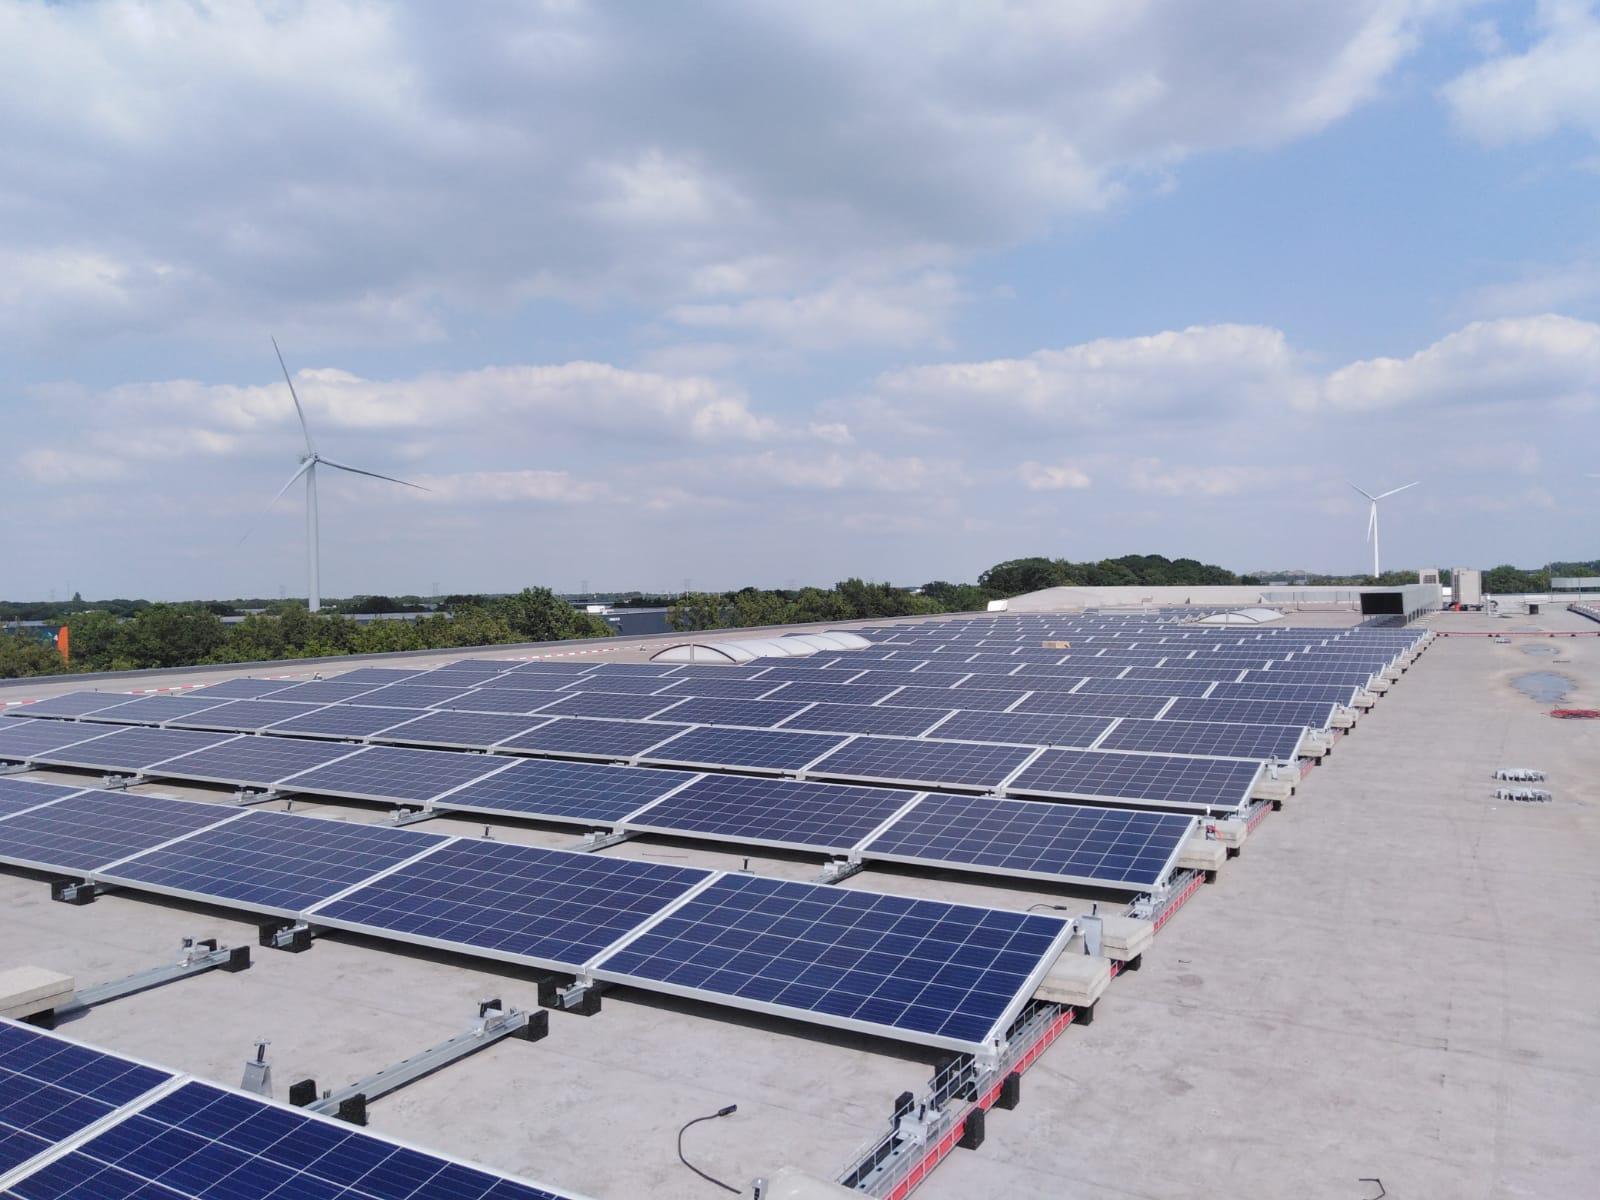 Tillburg_Photovoltaik.jpg